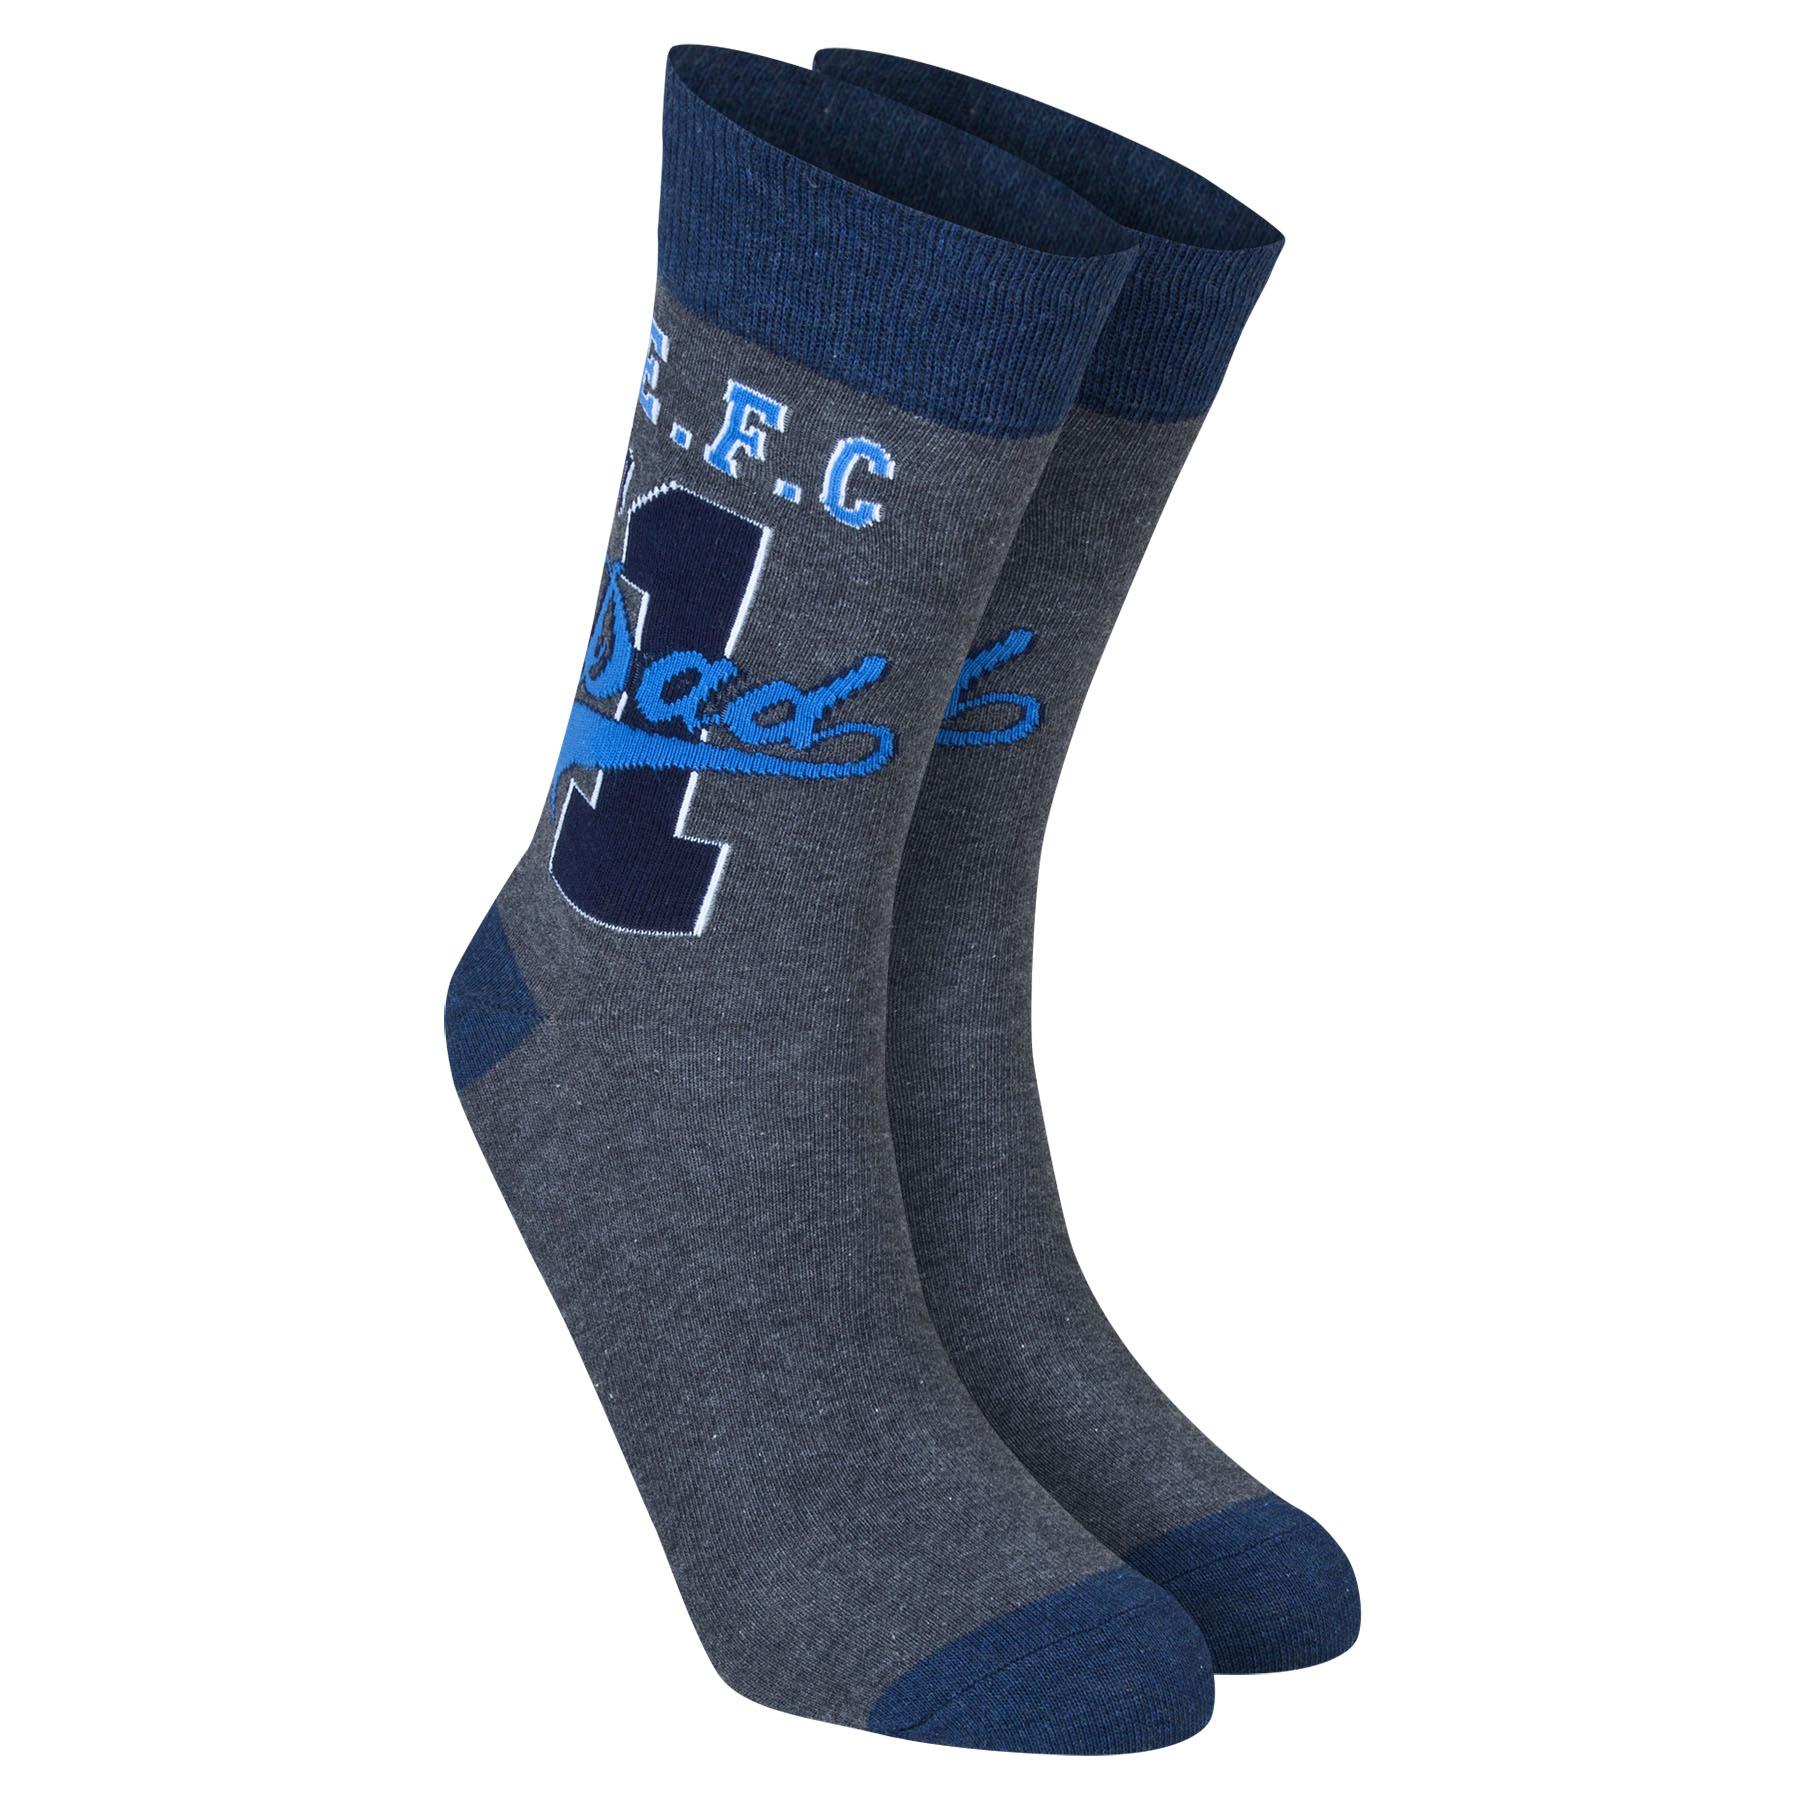 Everton Dad Socks - Charcoal Marl - Mens